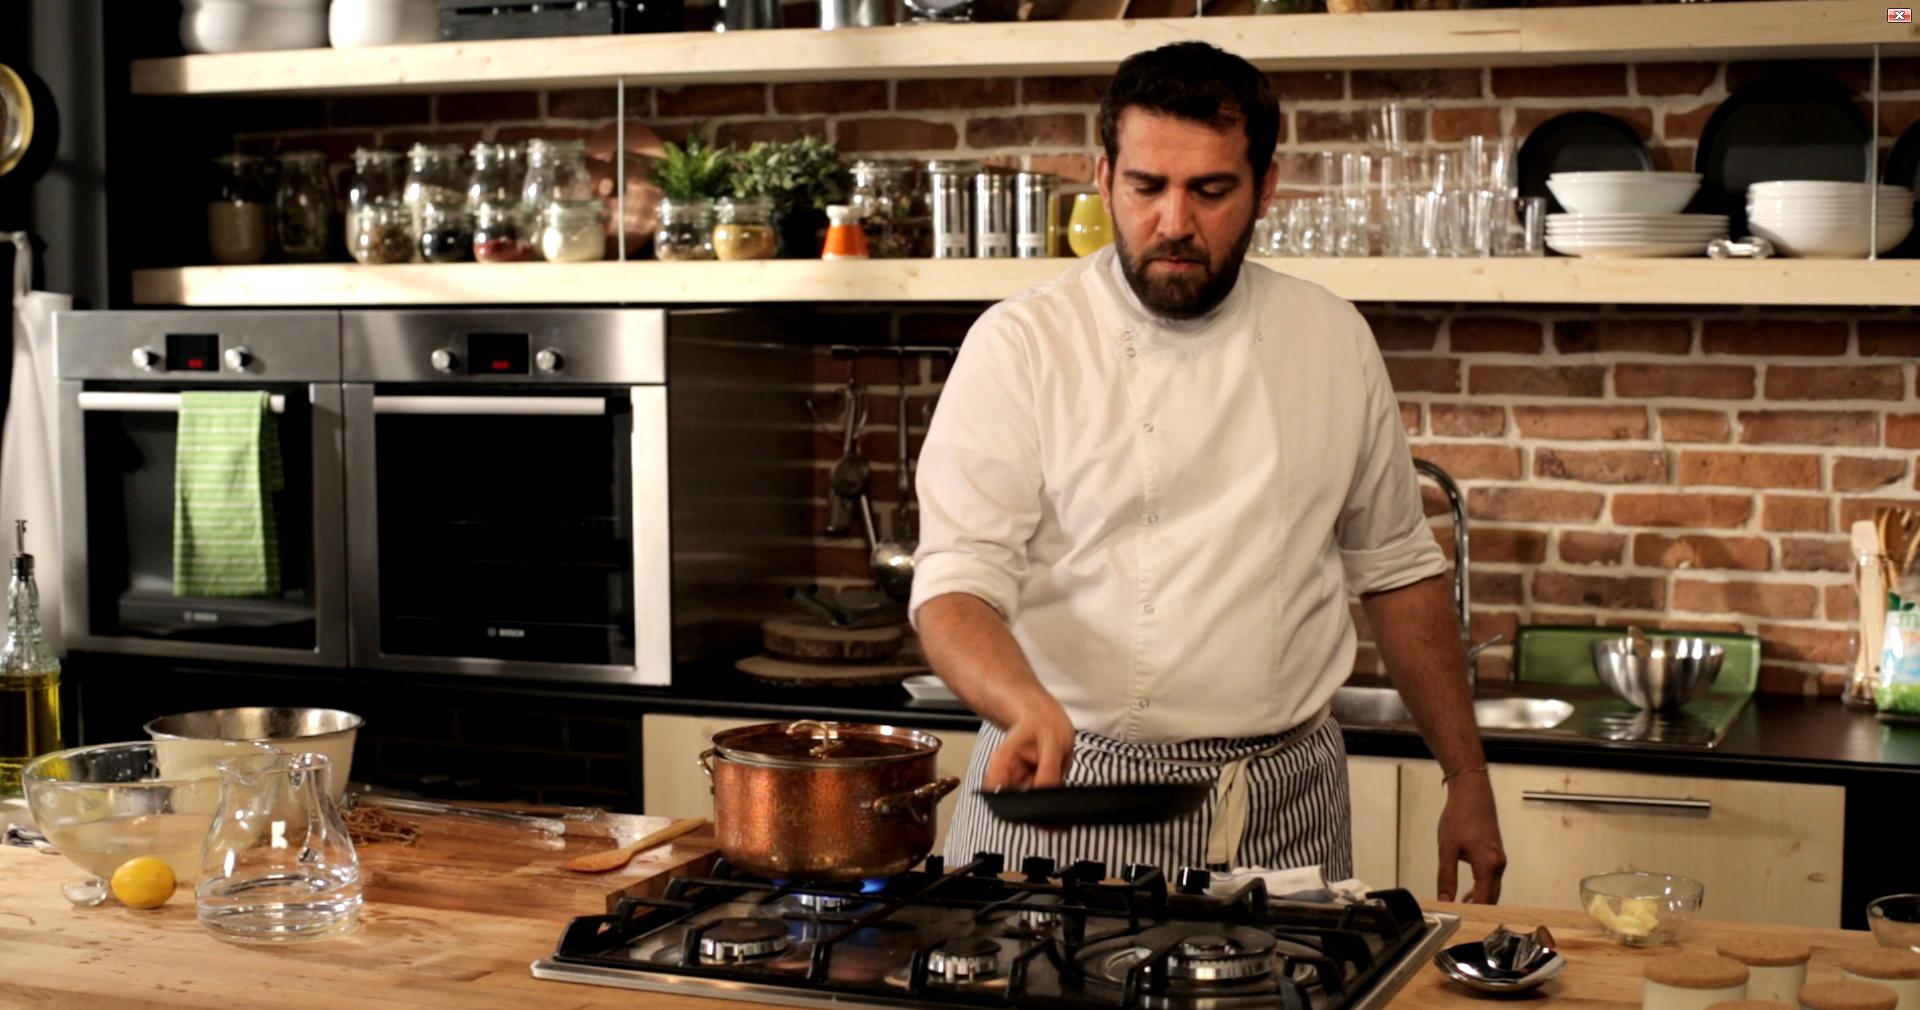 Fox Tv - Maksut Askar Kitchen